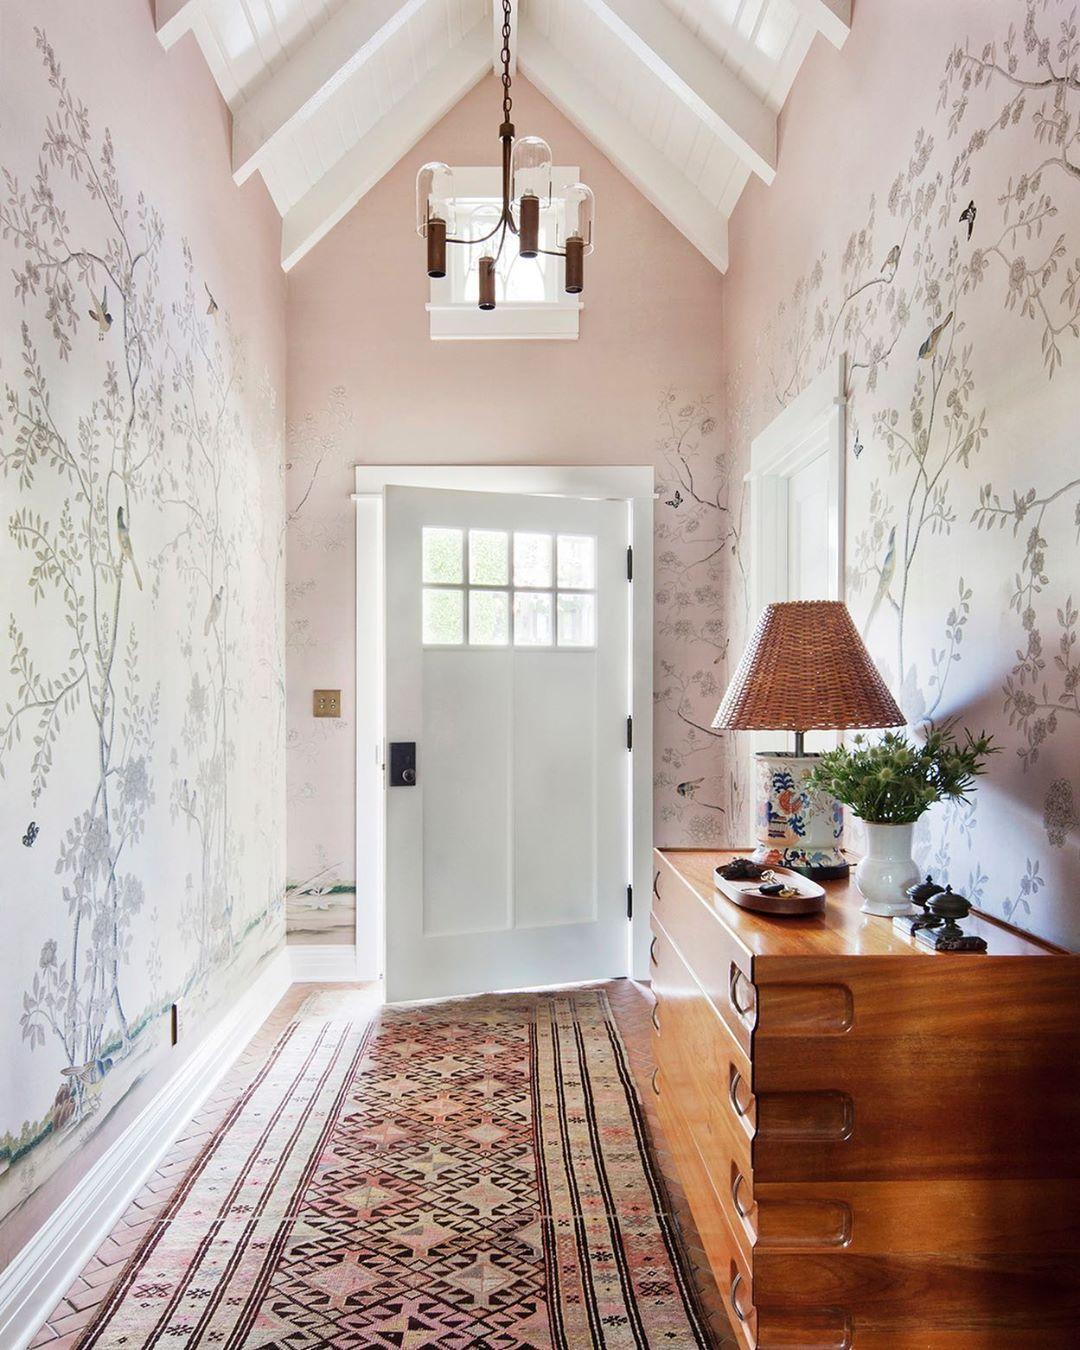 "Conservatory Room Addition In The Uk 1040x1485 In 2020: De Gournay Russia On Instagram: ""Интерьер холла от калифорнийского дизайнера Кристин Панич"